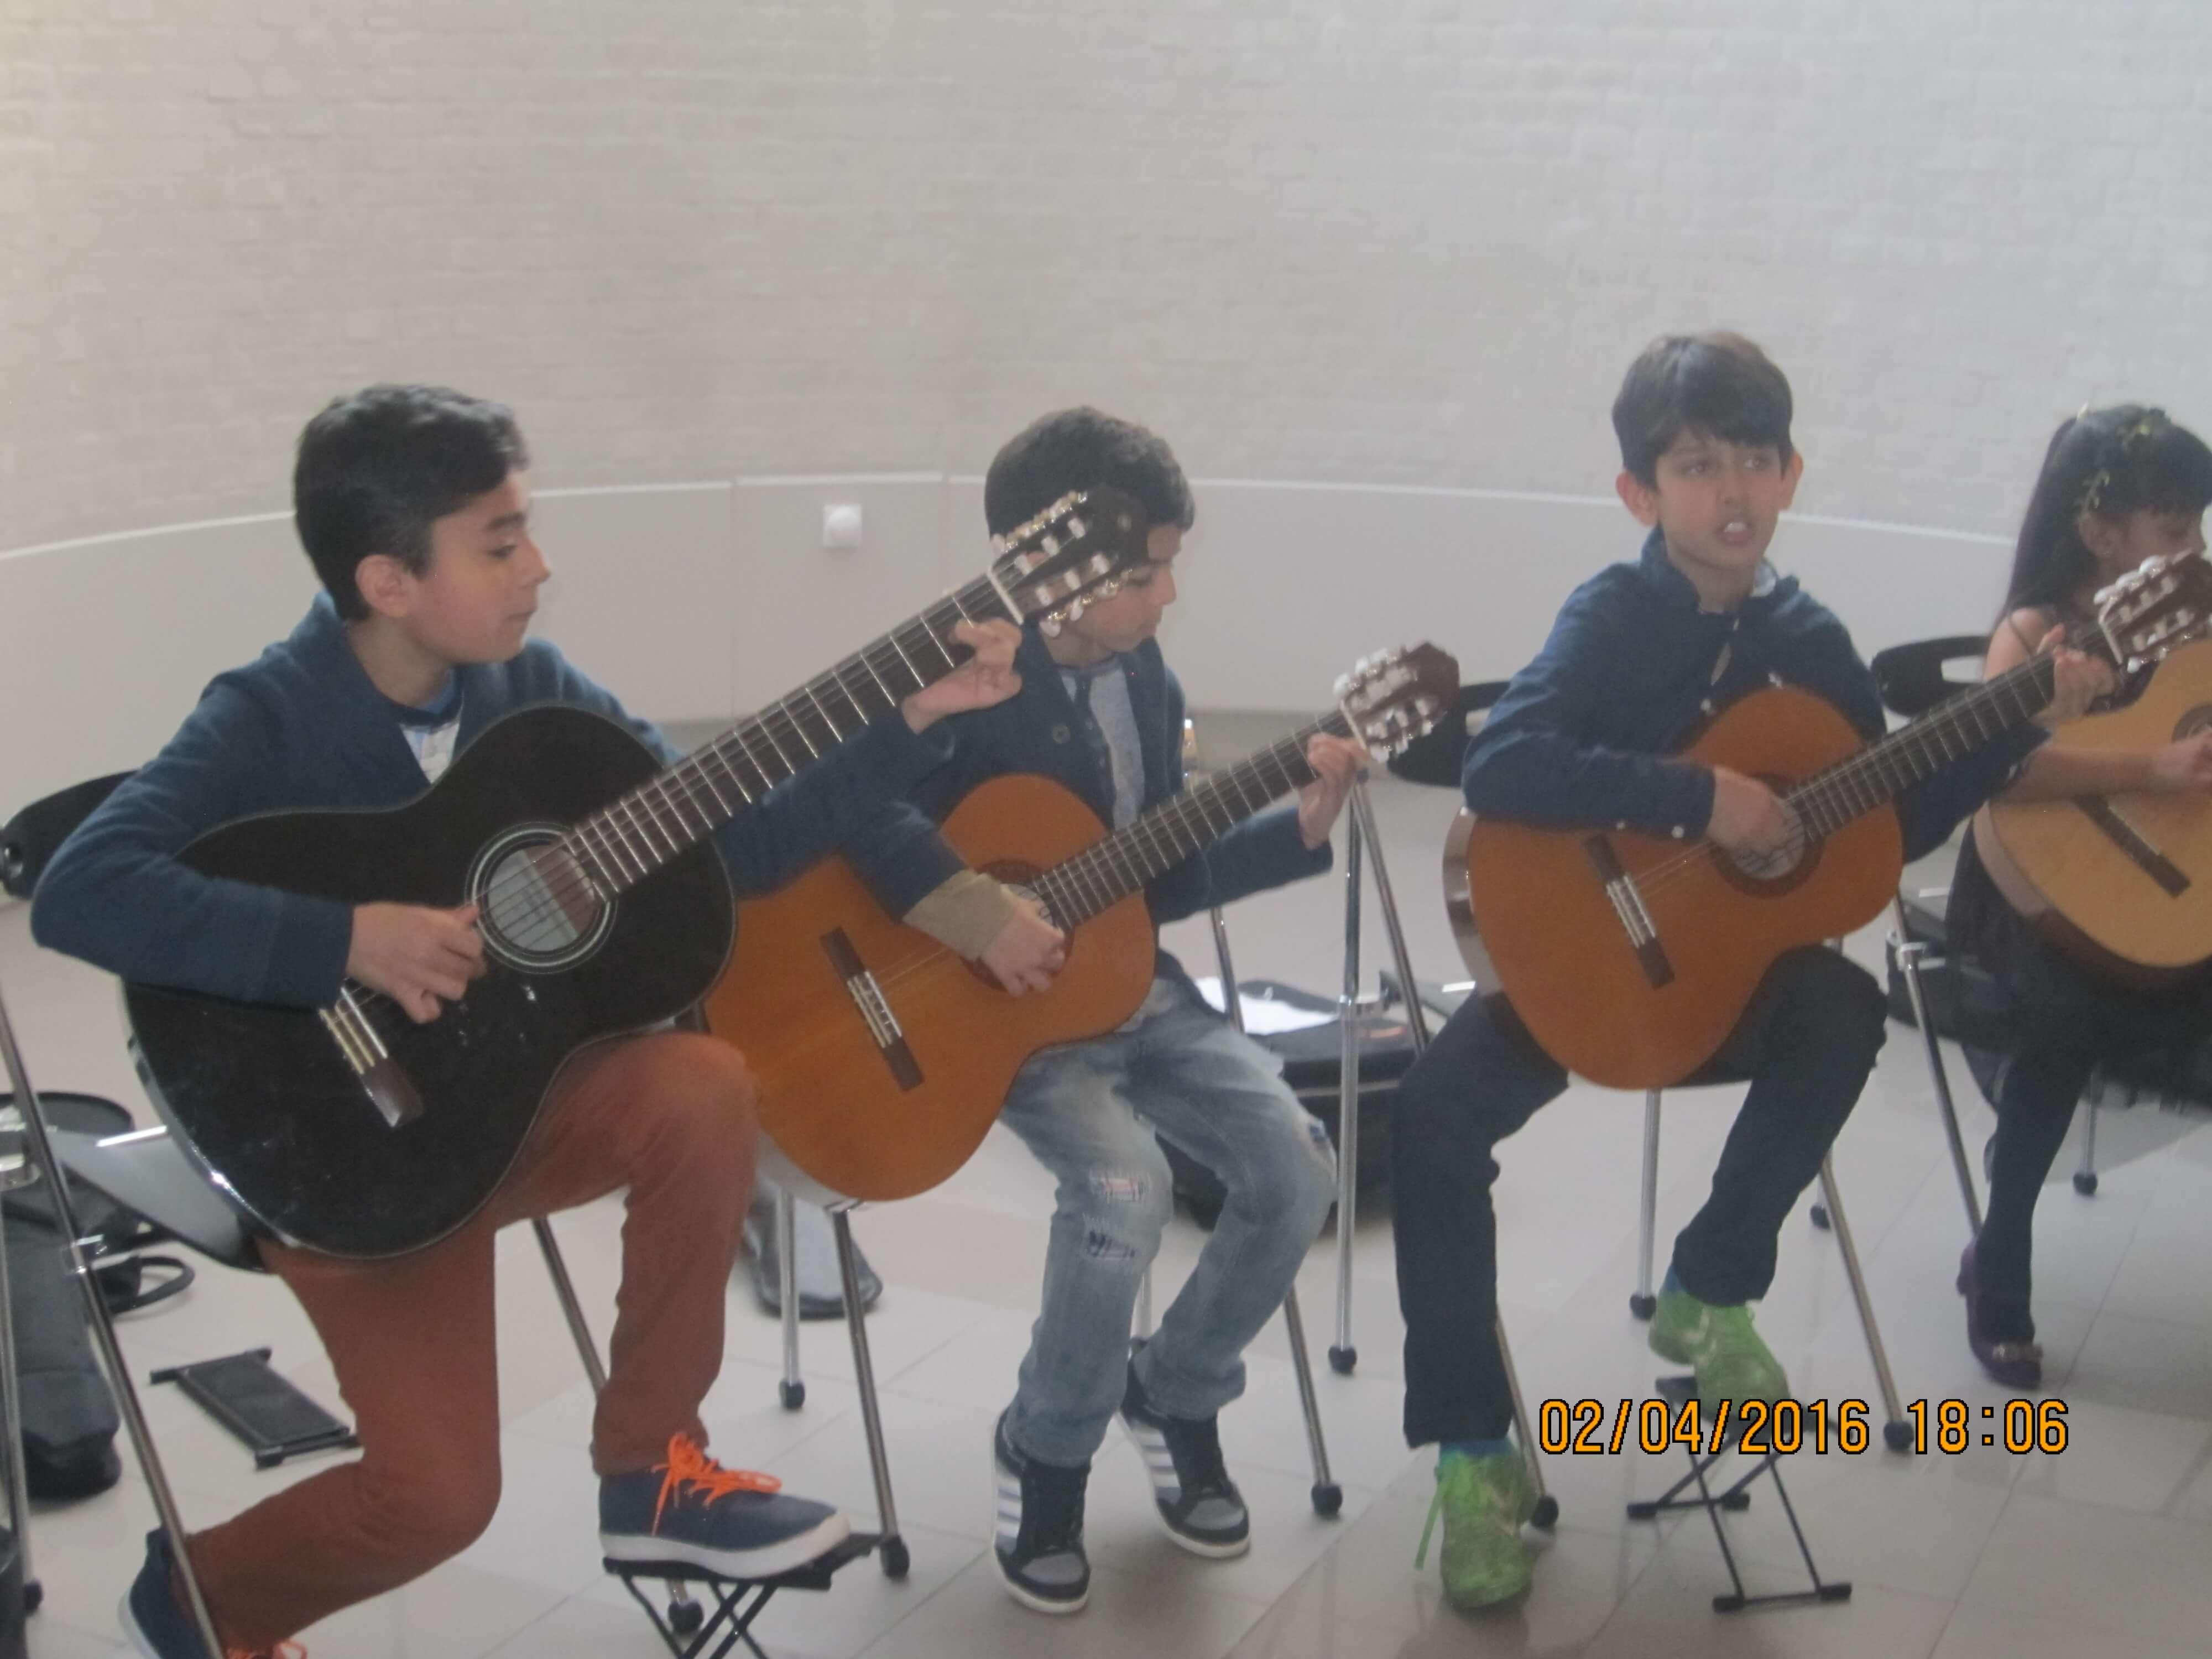 Trio in backstage